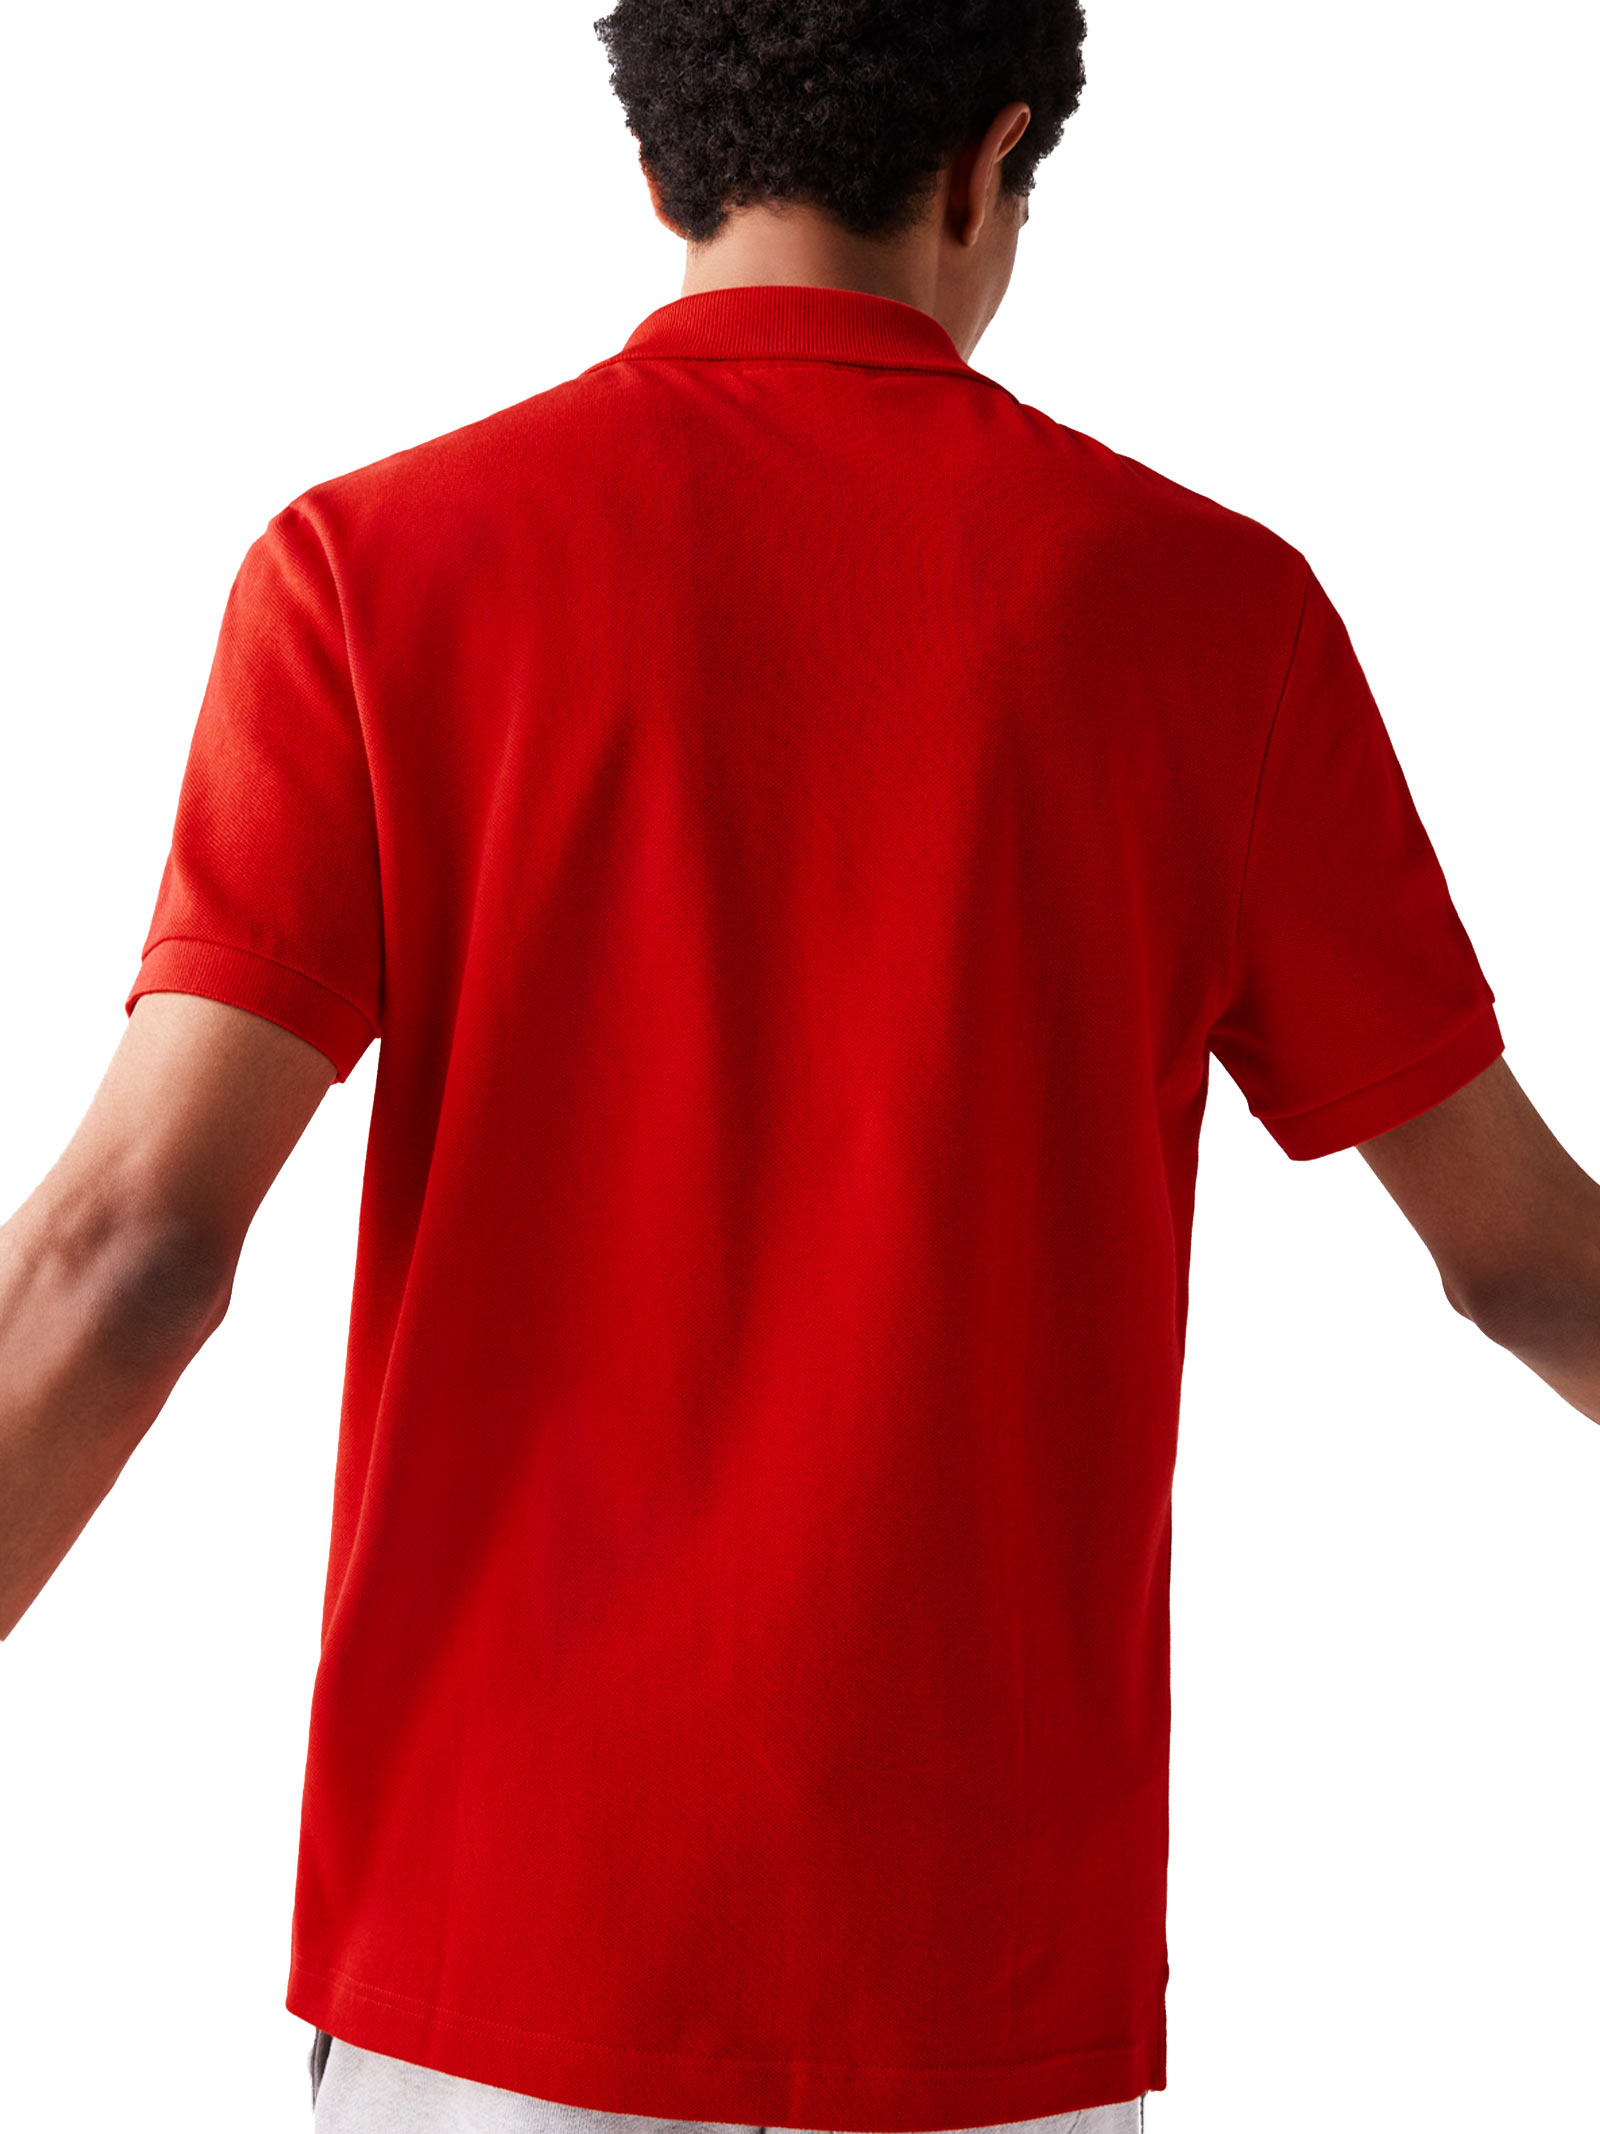 Polo slim fit rossa LACOSTE | Polo | PH4012240